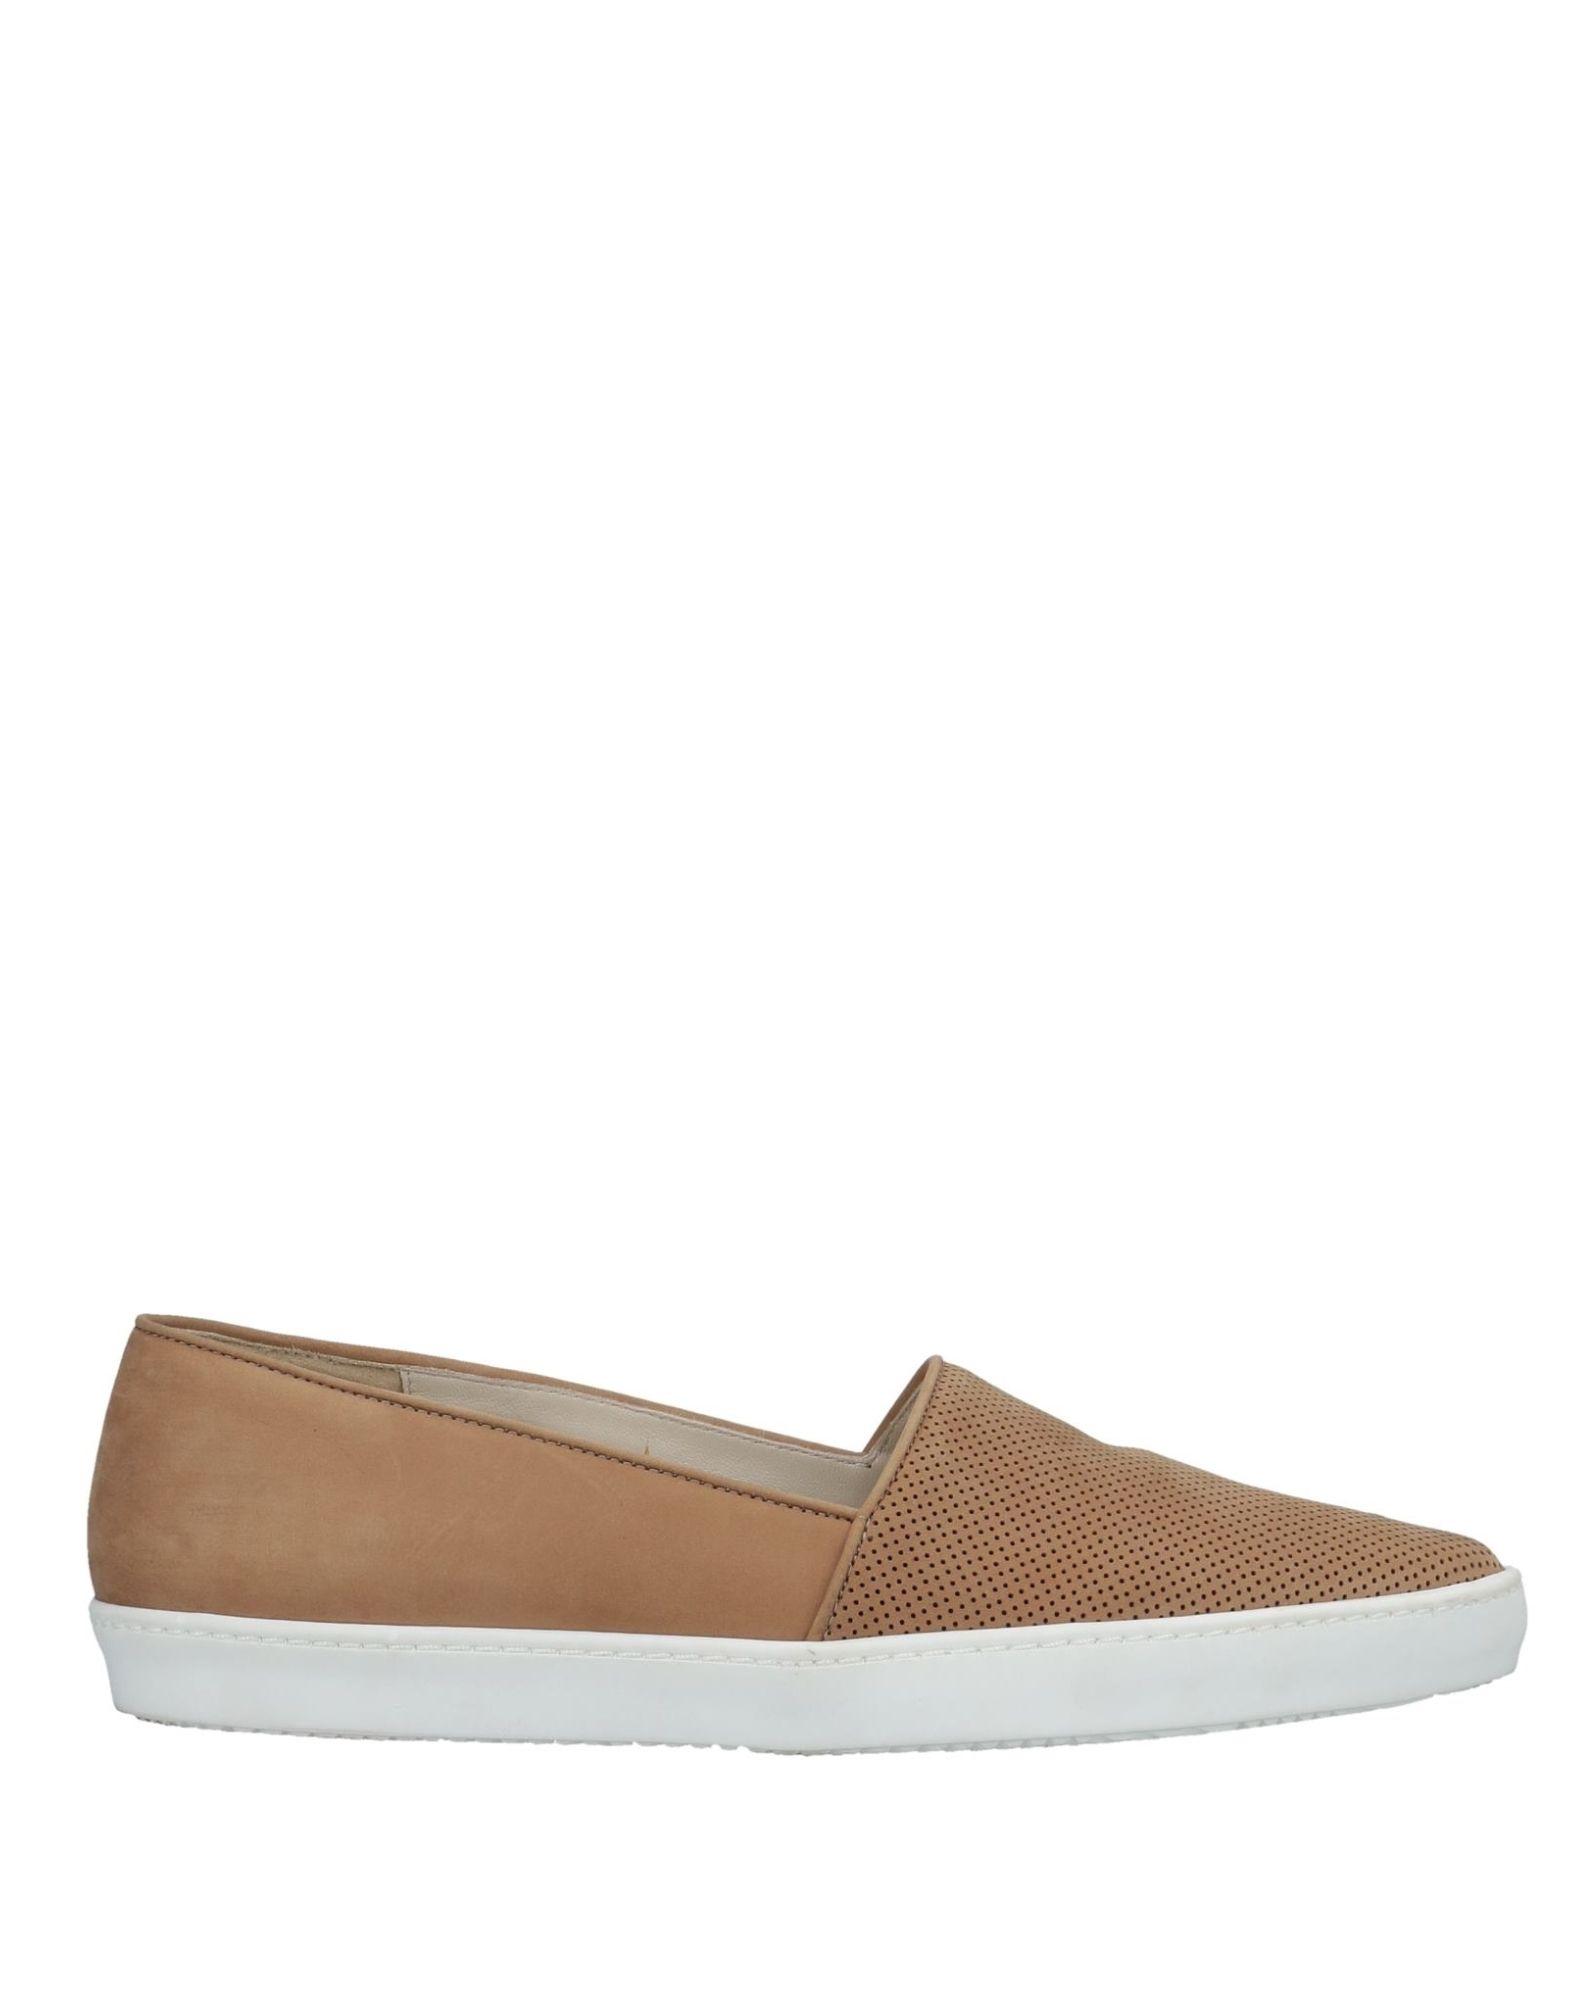 Fabio Rusconi Sneakers Damen  11552587KB Gute Qualität beliebte Schuhe